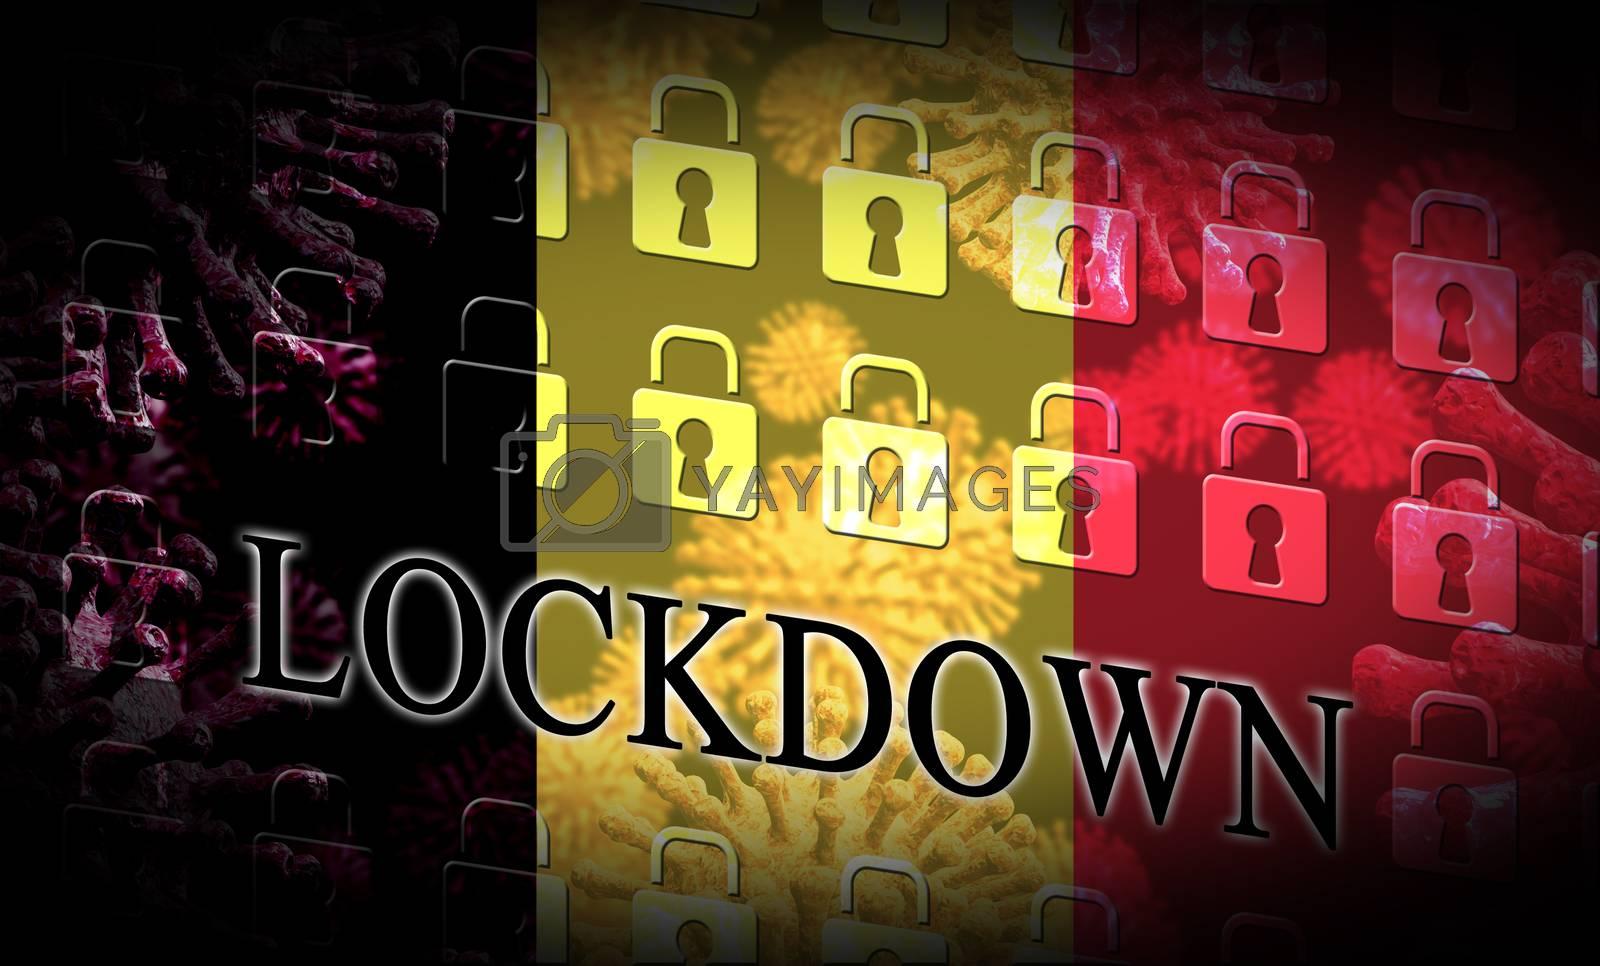 Belgium lockdown controlling coronavirus epidemic or outbreak -  by stuartmiles